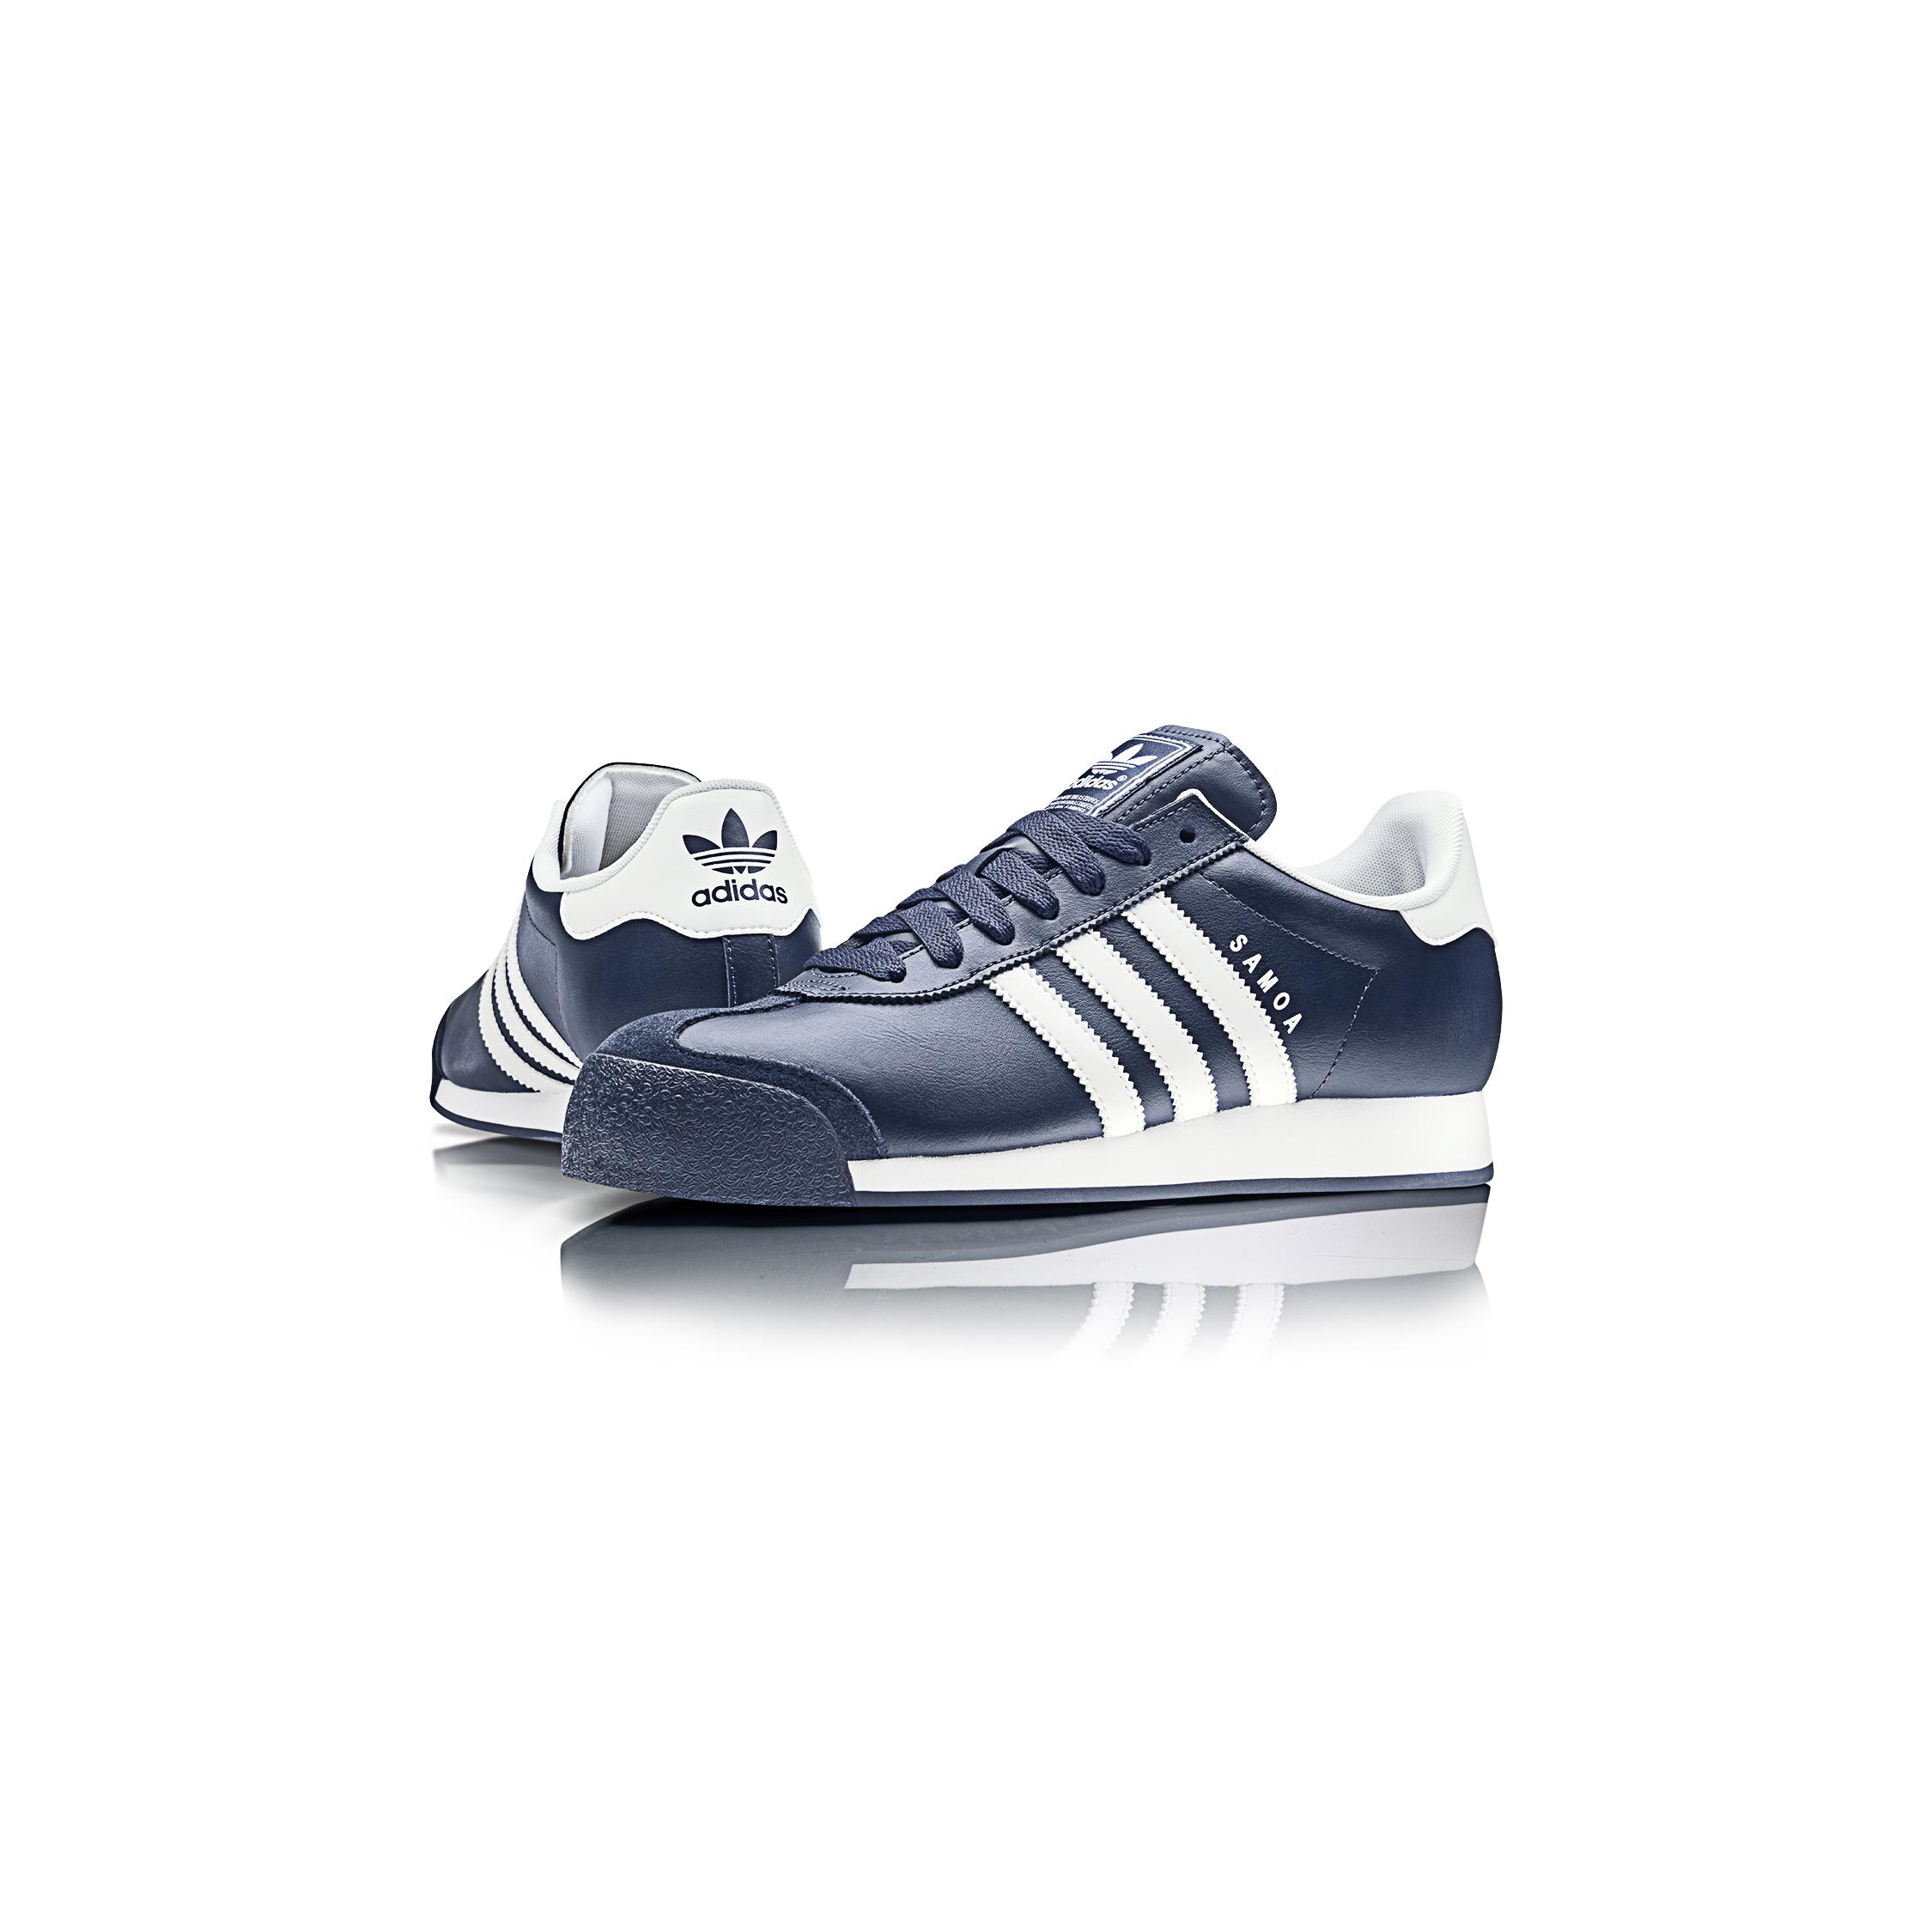 Adidas_Iconics_G24861.jpg